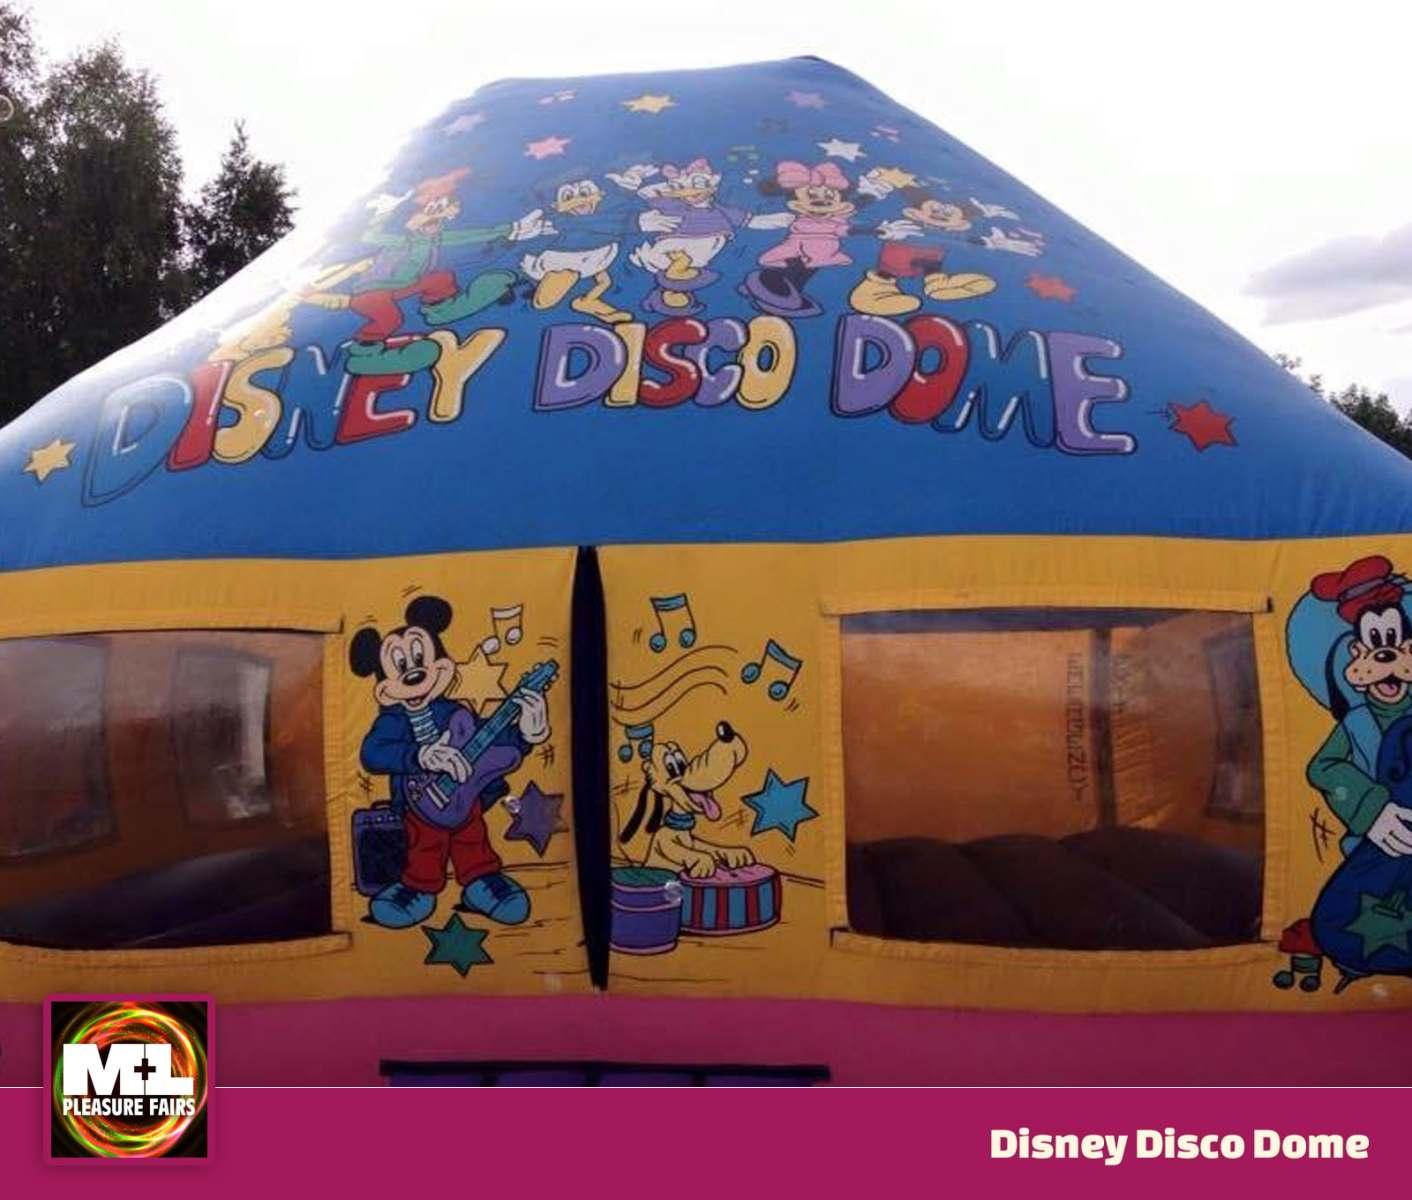 Disney Disco Dome